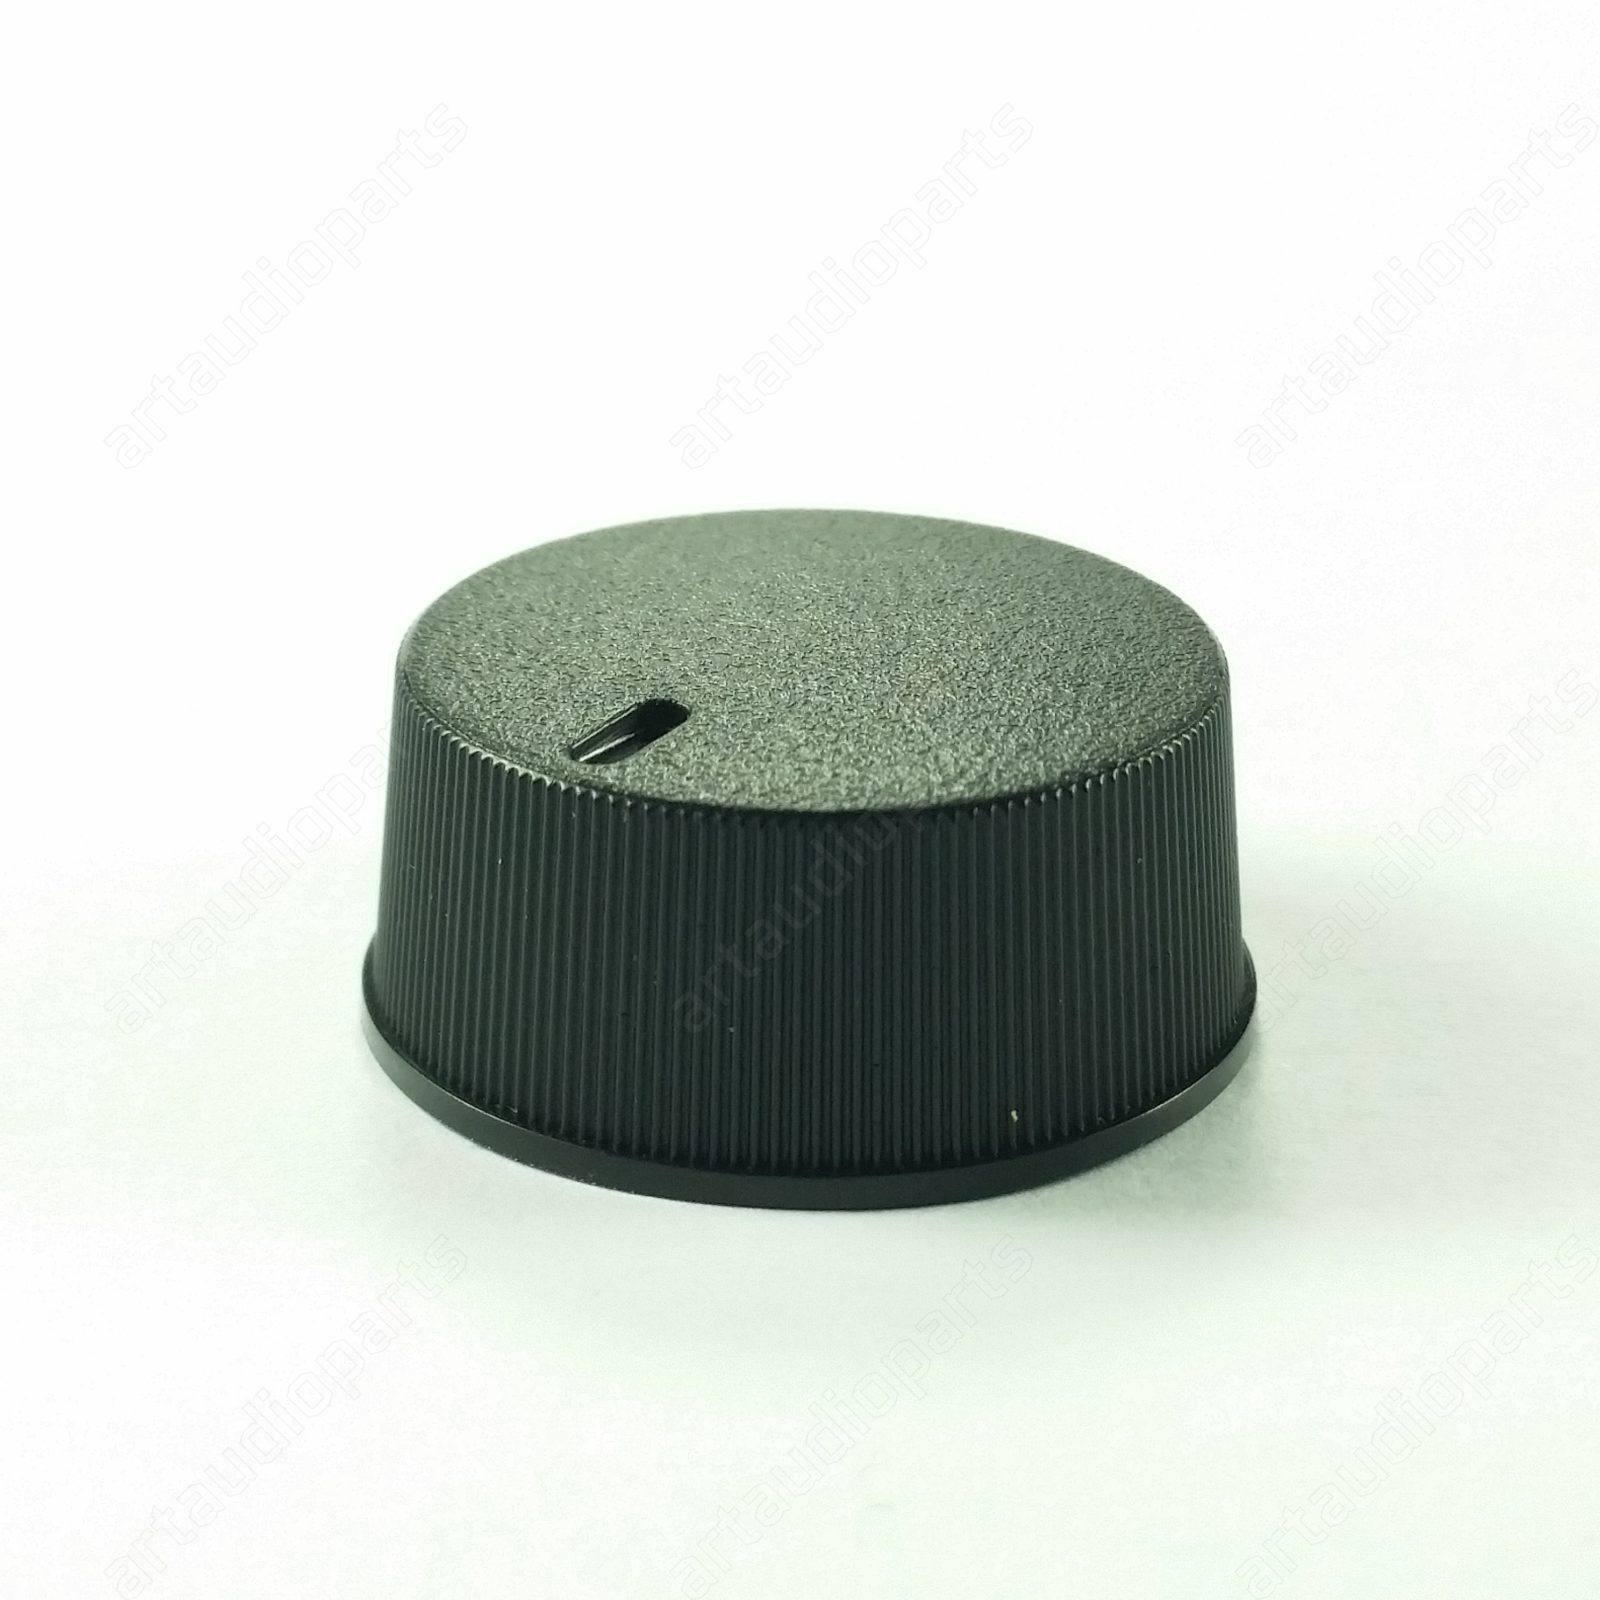 Master Volume Knob Black for Yamaha PSR-S750 PSR-S950 PSR-S770 PSR-S970  CVP605 CVP609